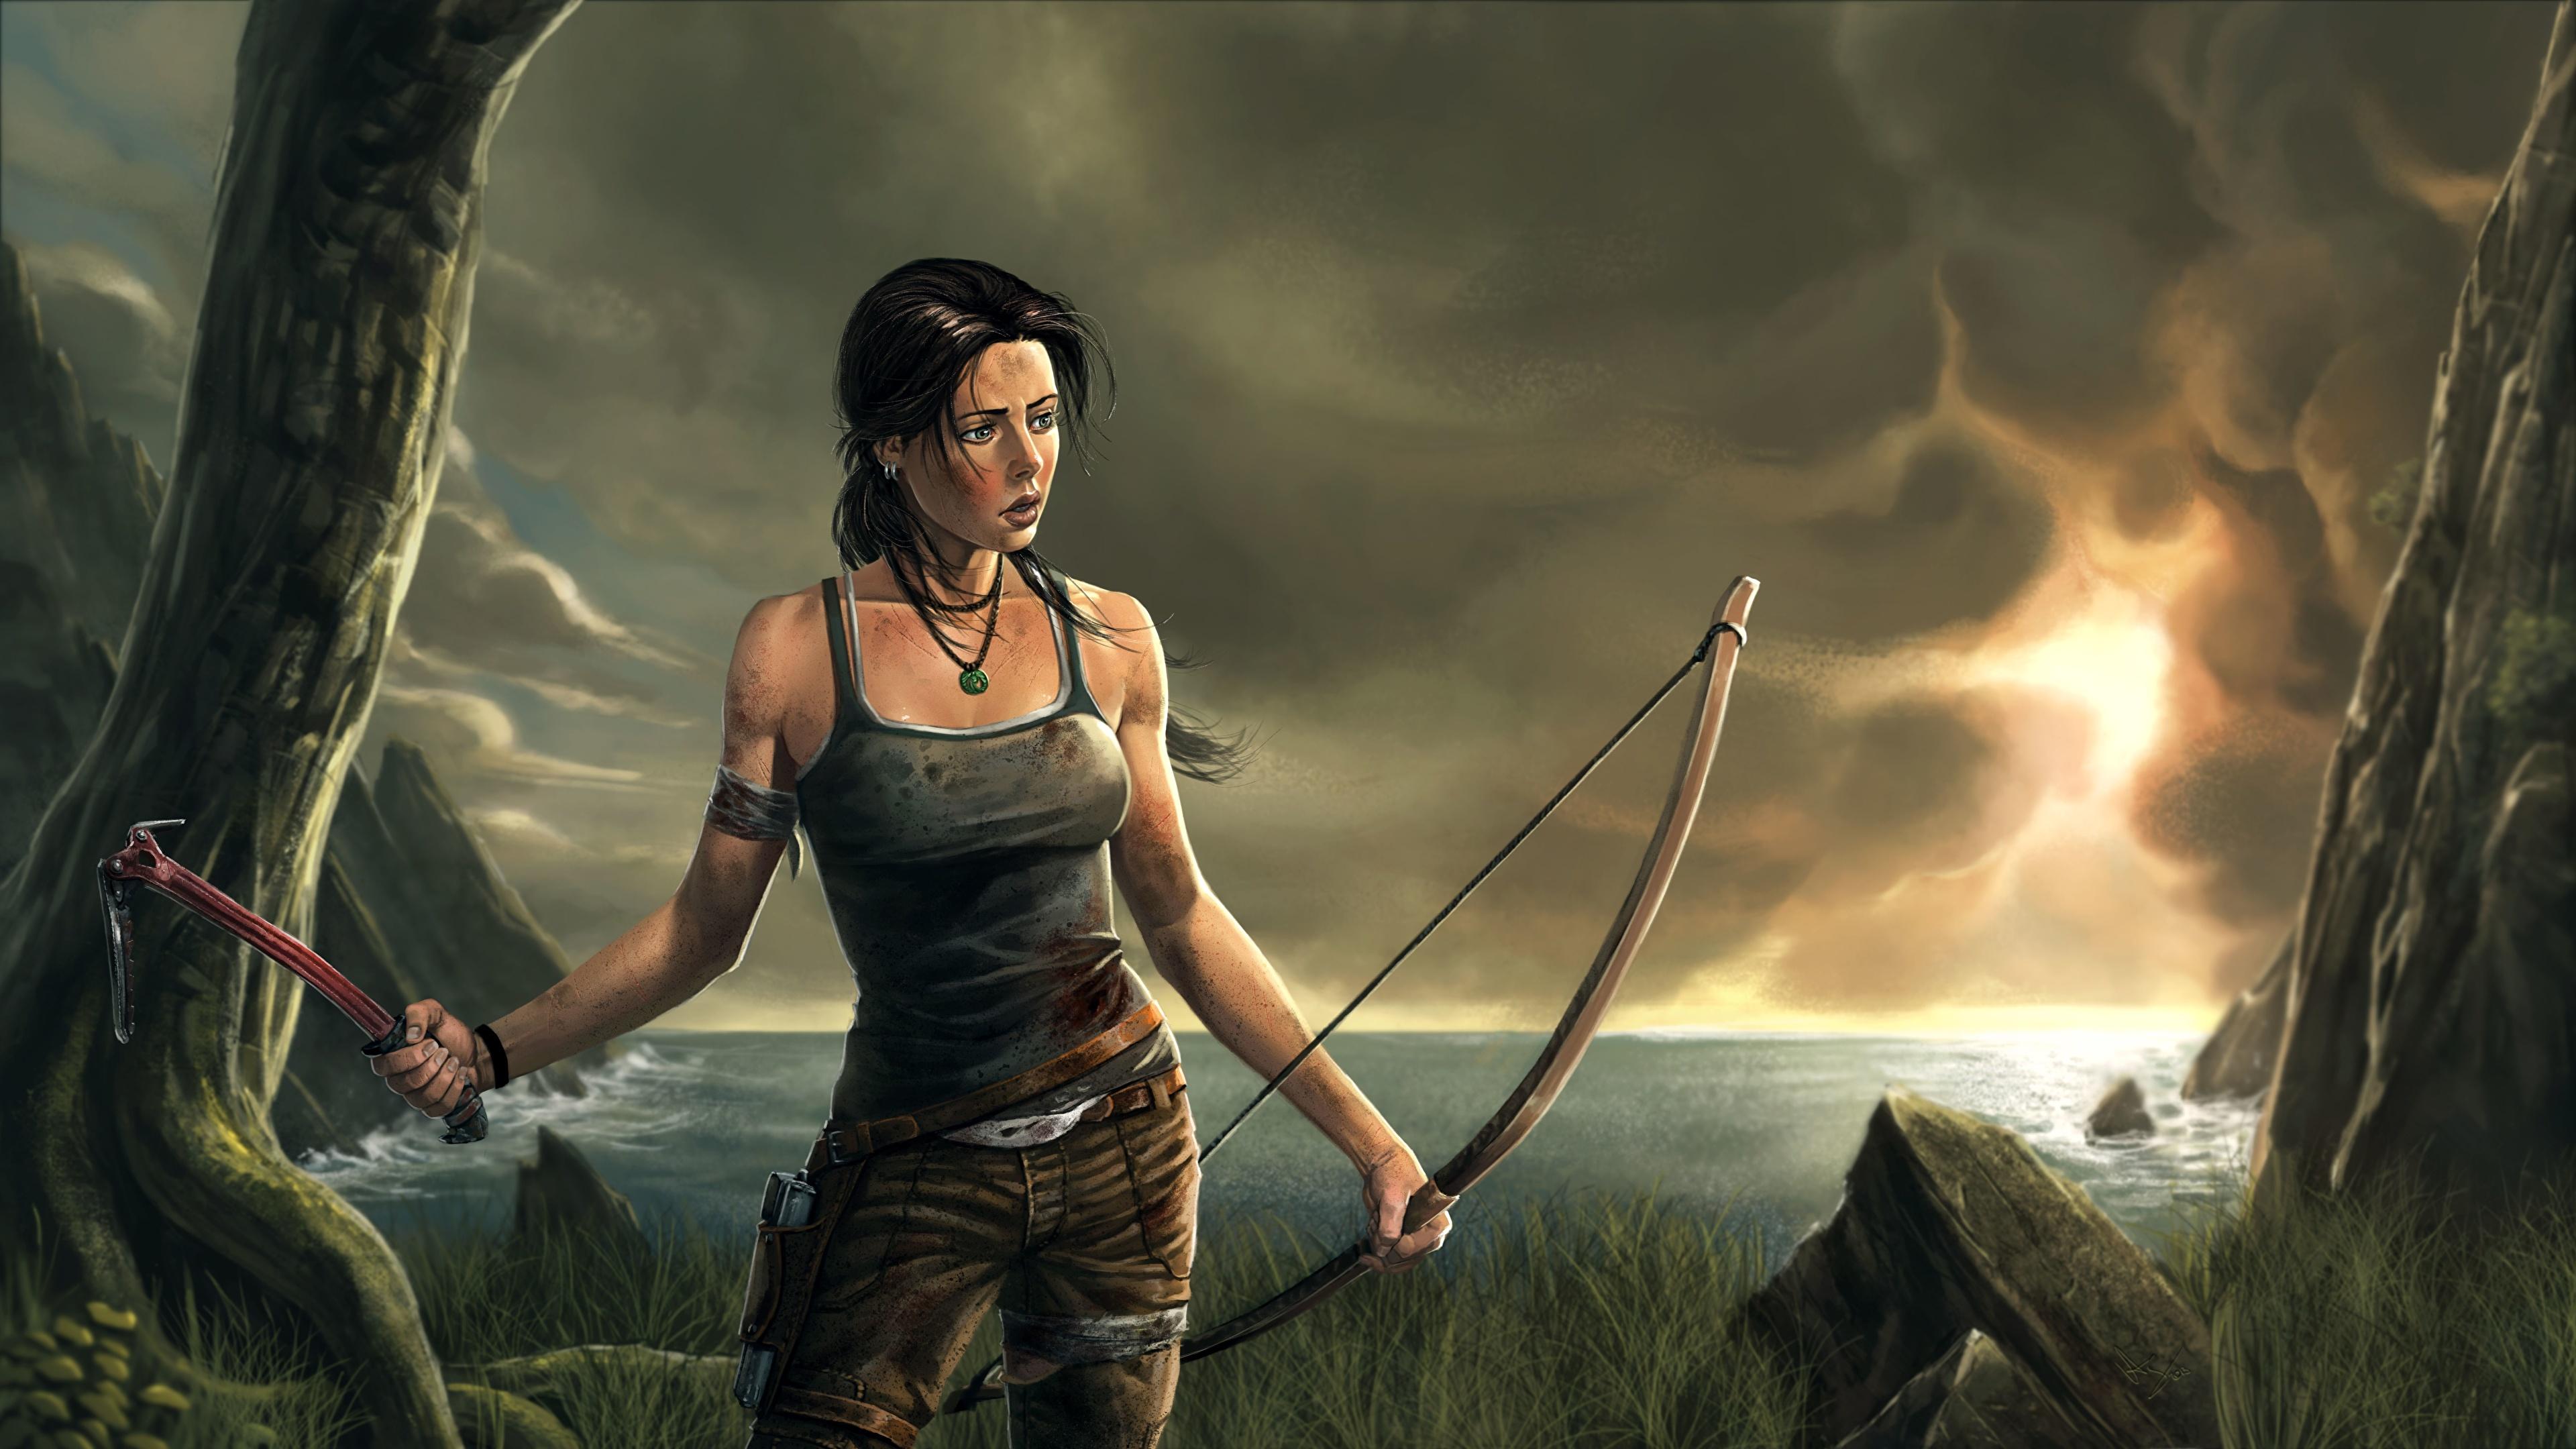 Photos Tomb Raider Tomb Raider 2013 Archers Lara Croft 3840x2160